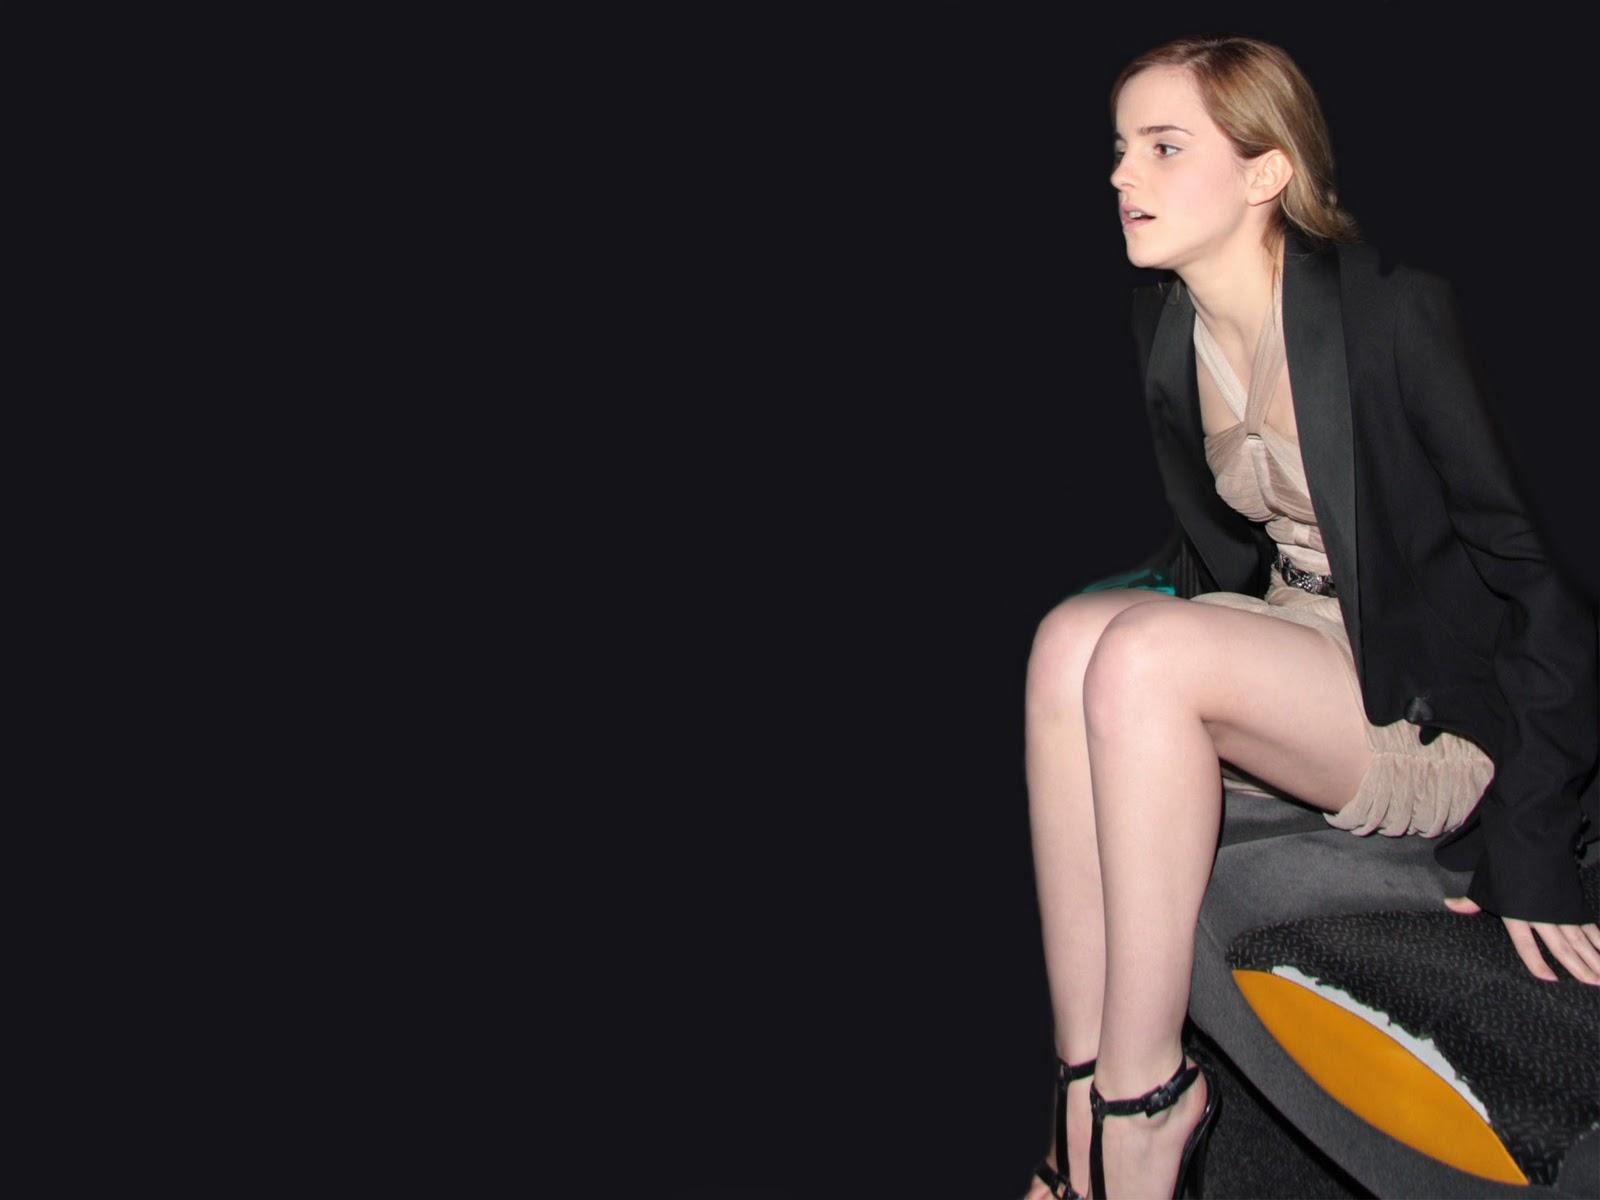 Automotive Area Emma Watson Hot Wallpapers